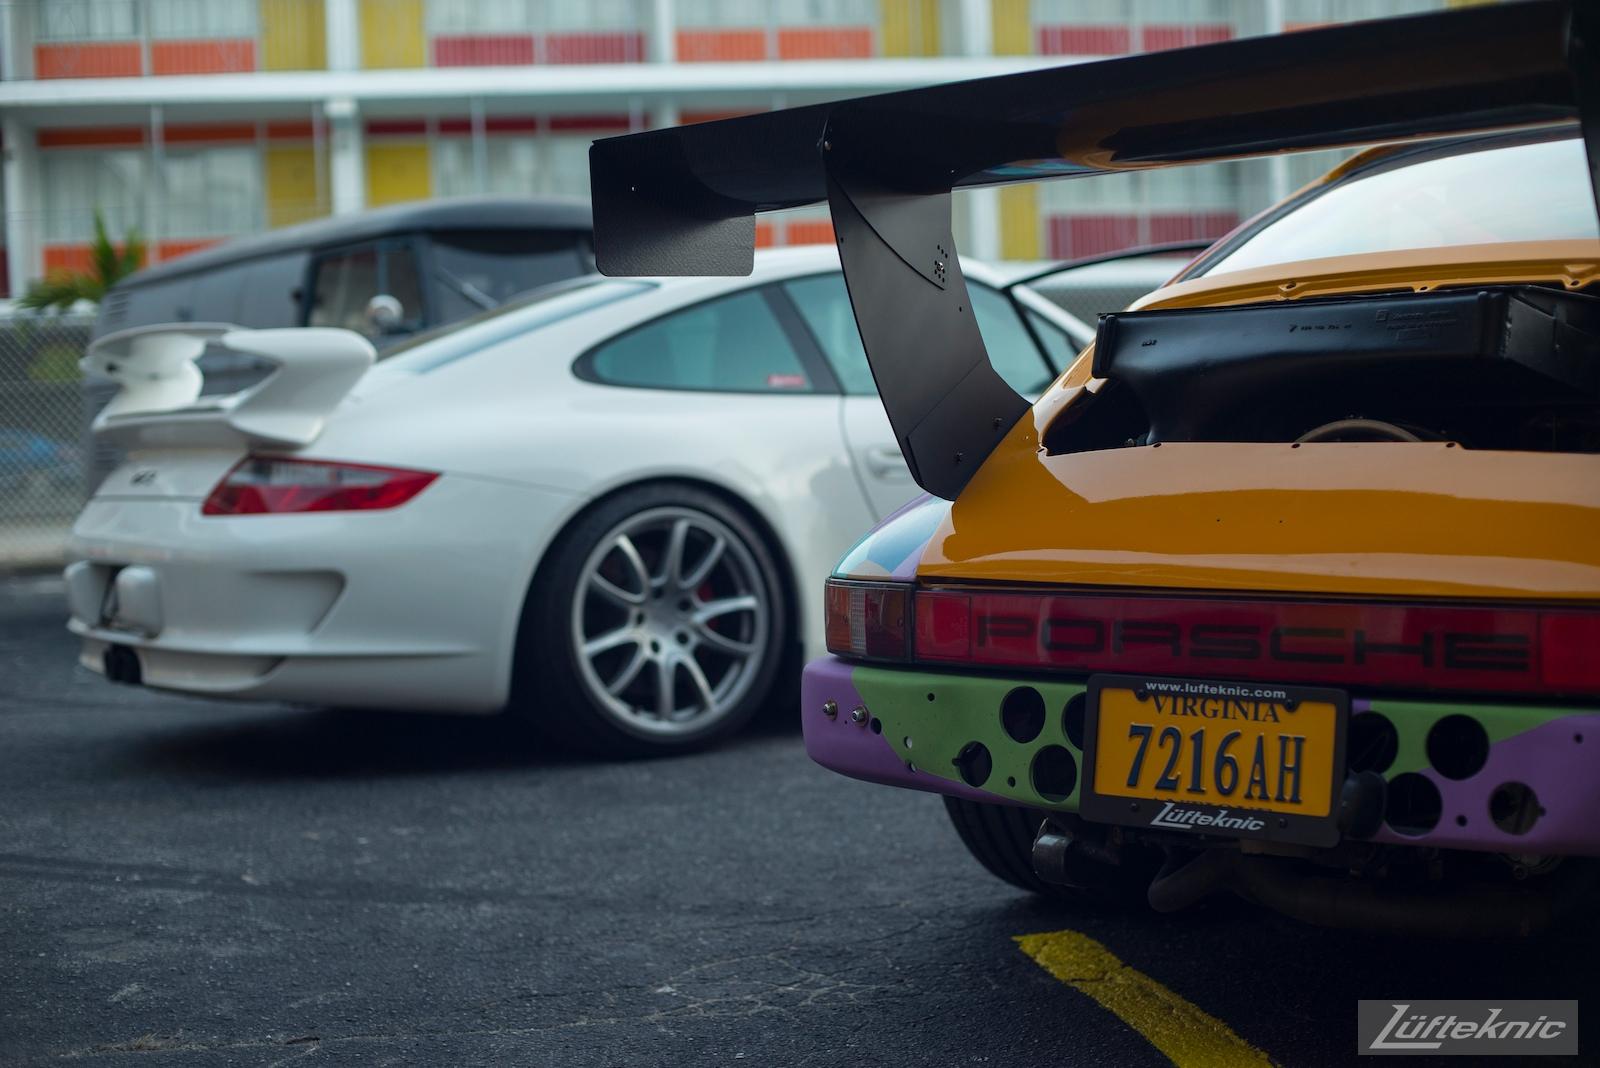 Lüfteknic #projectstuka Porsche 930 Turbo rear end with a gt3